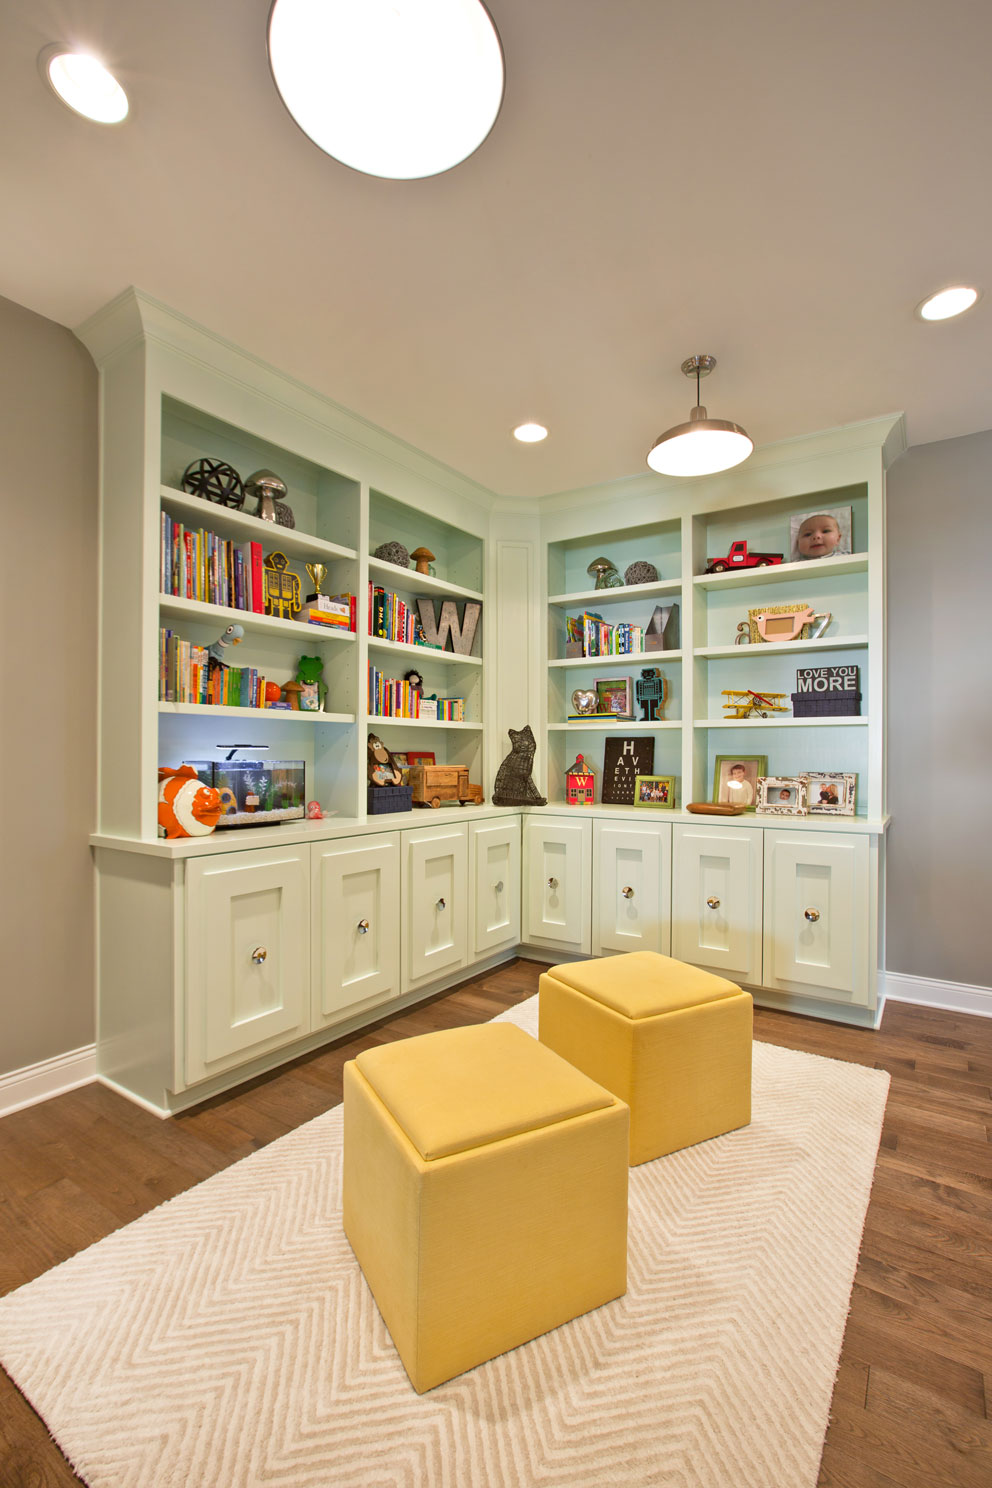 Courtney Casteel, Interior Design Playroom design